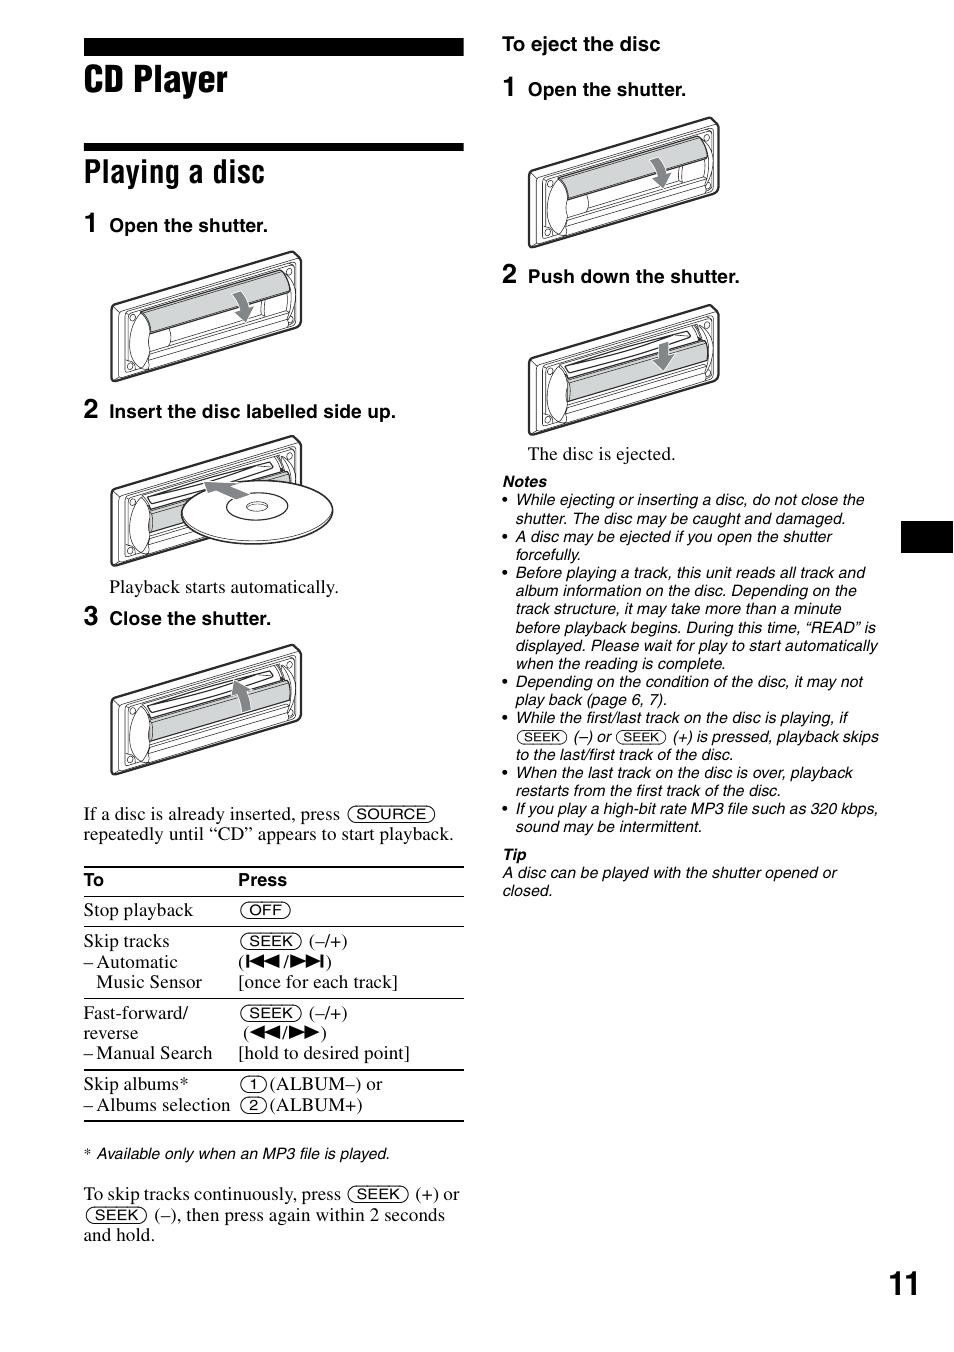 CDX-R3300 MANUAL PDF